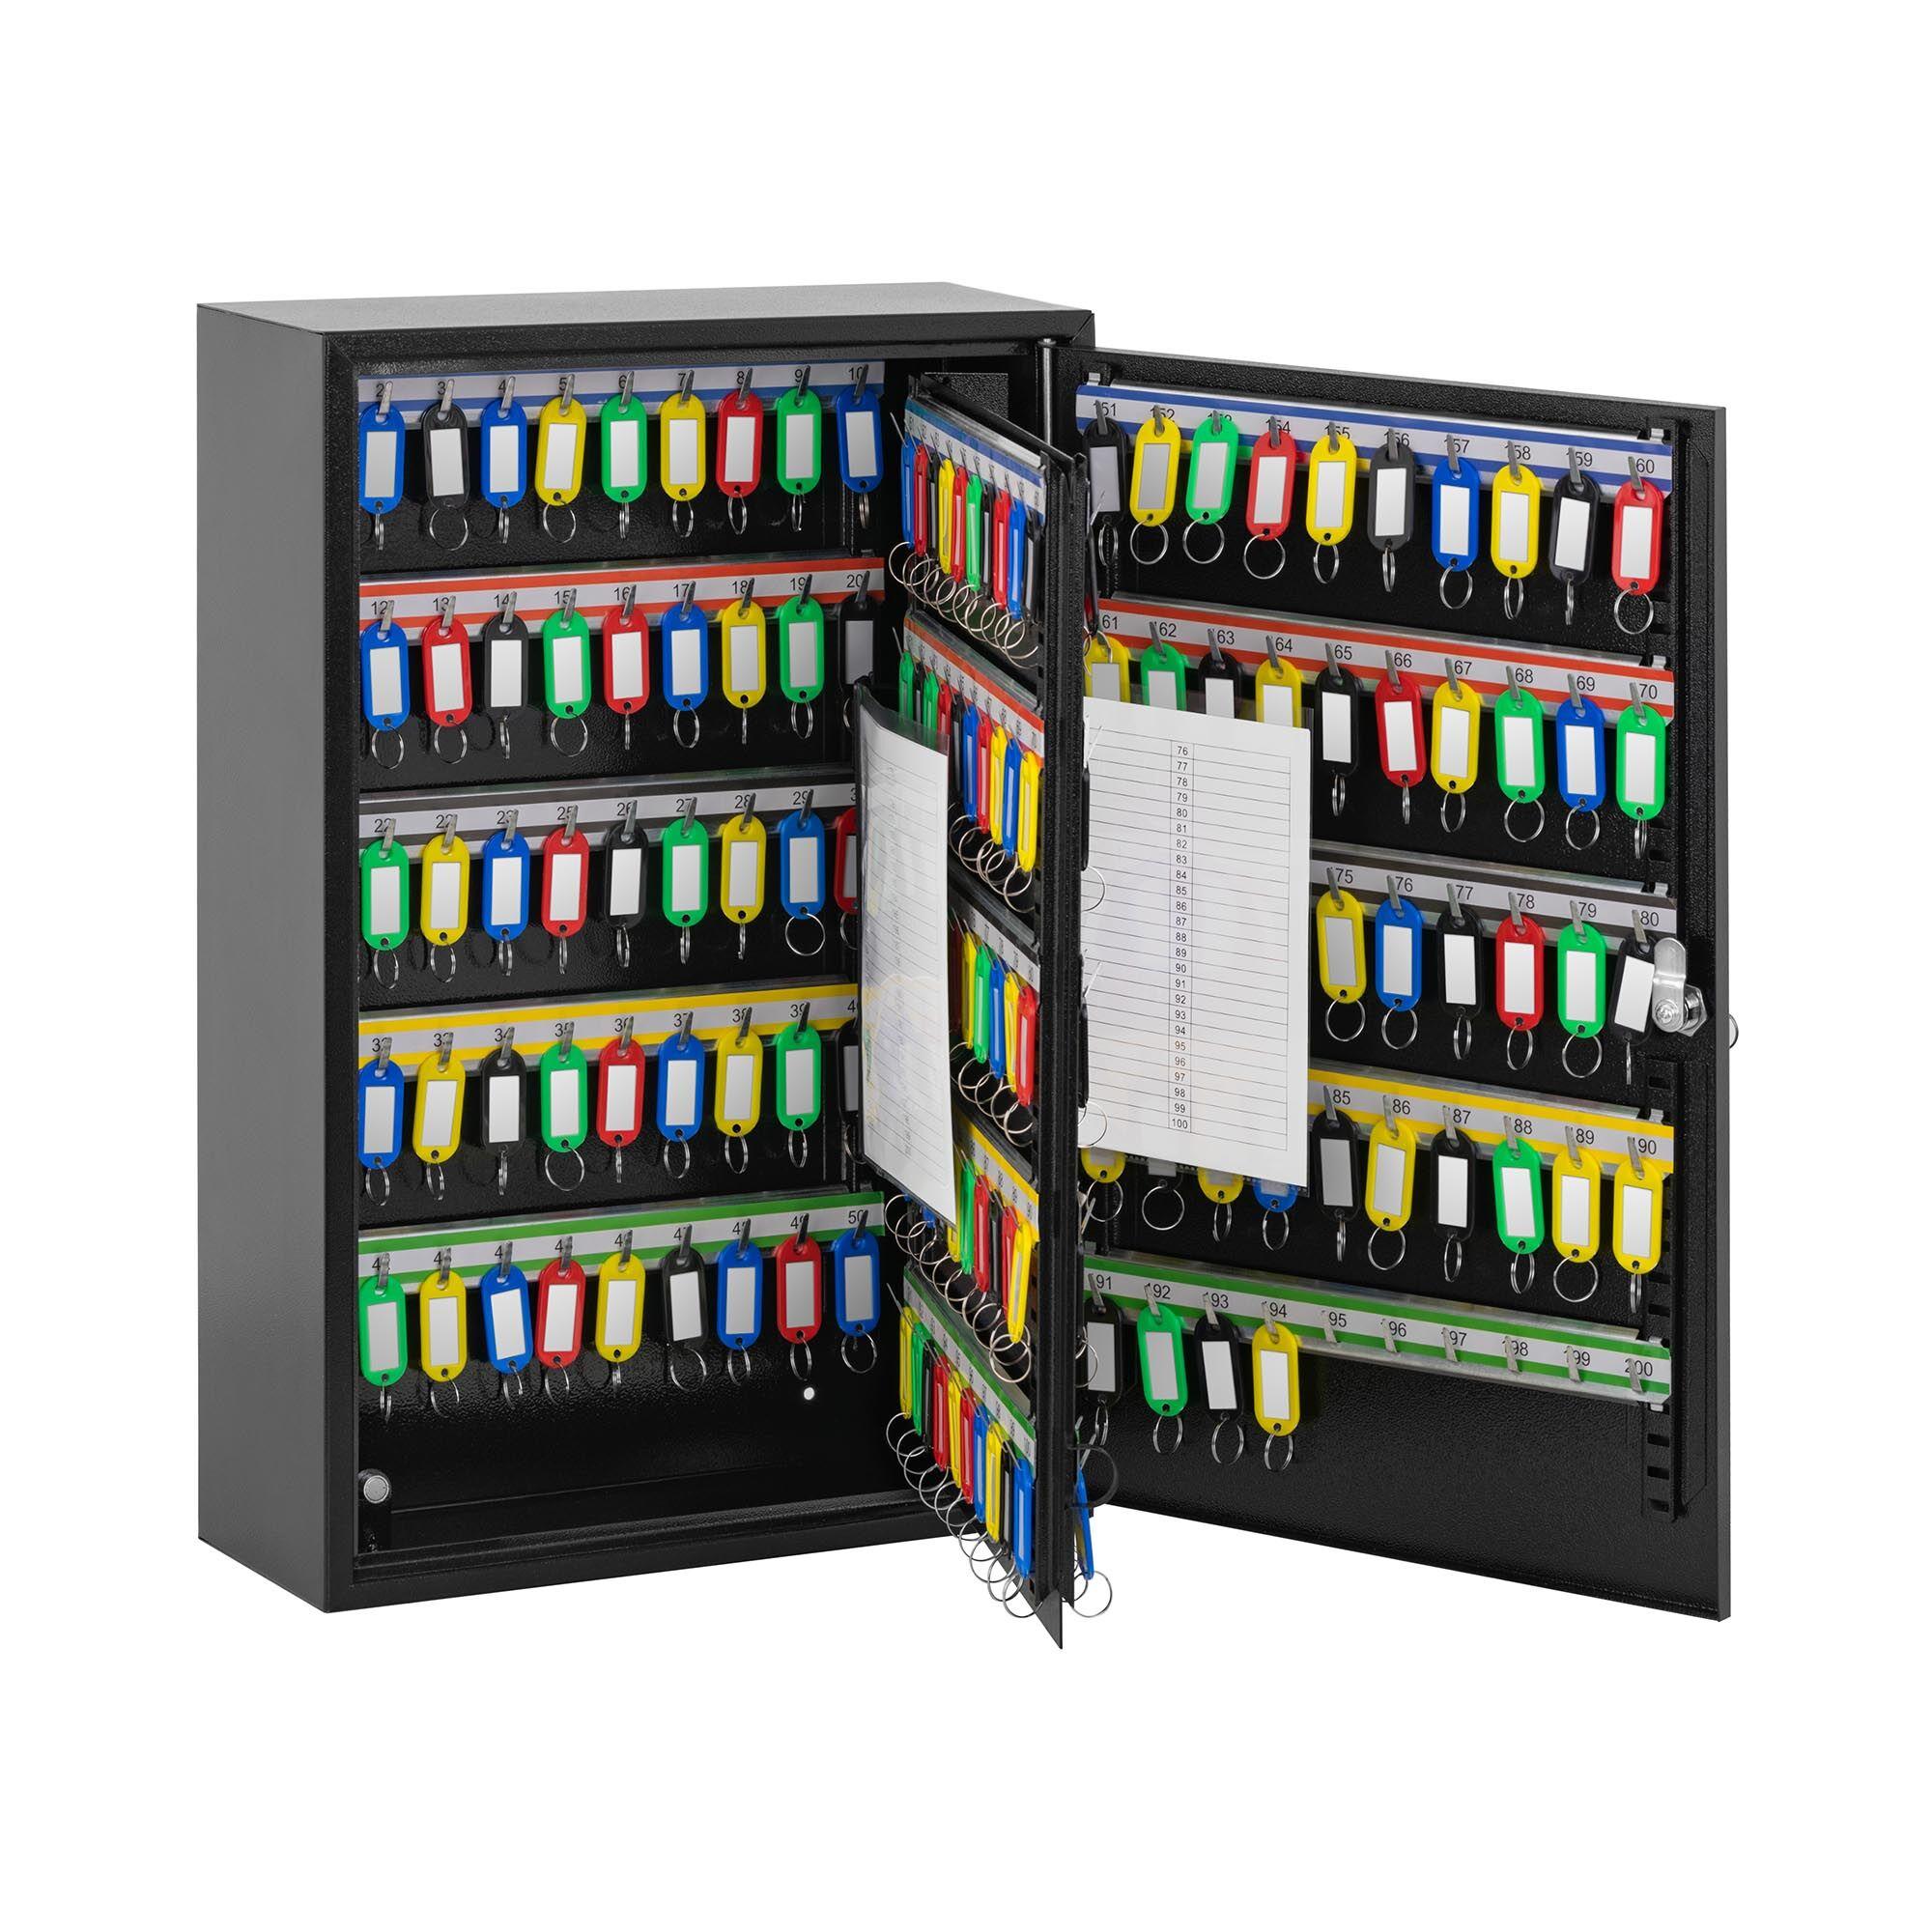 Stamony Key Cabinet - for 200 keys - incl. key tags ST-KB-200